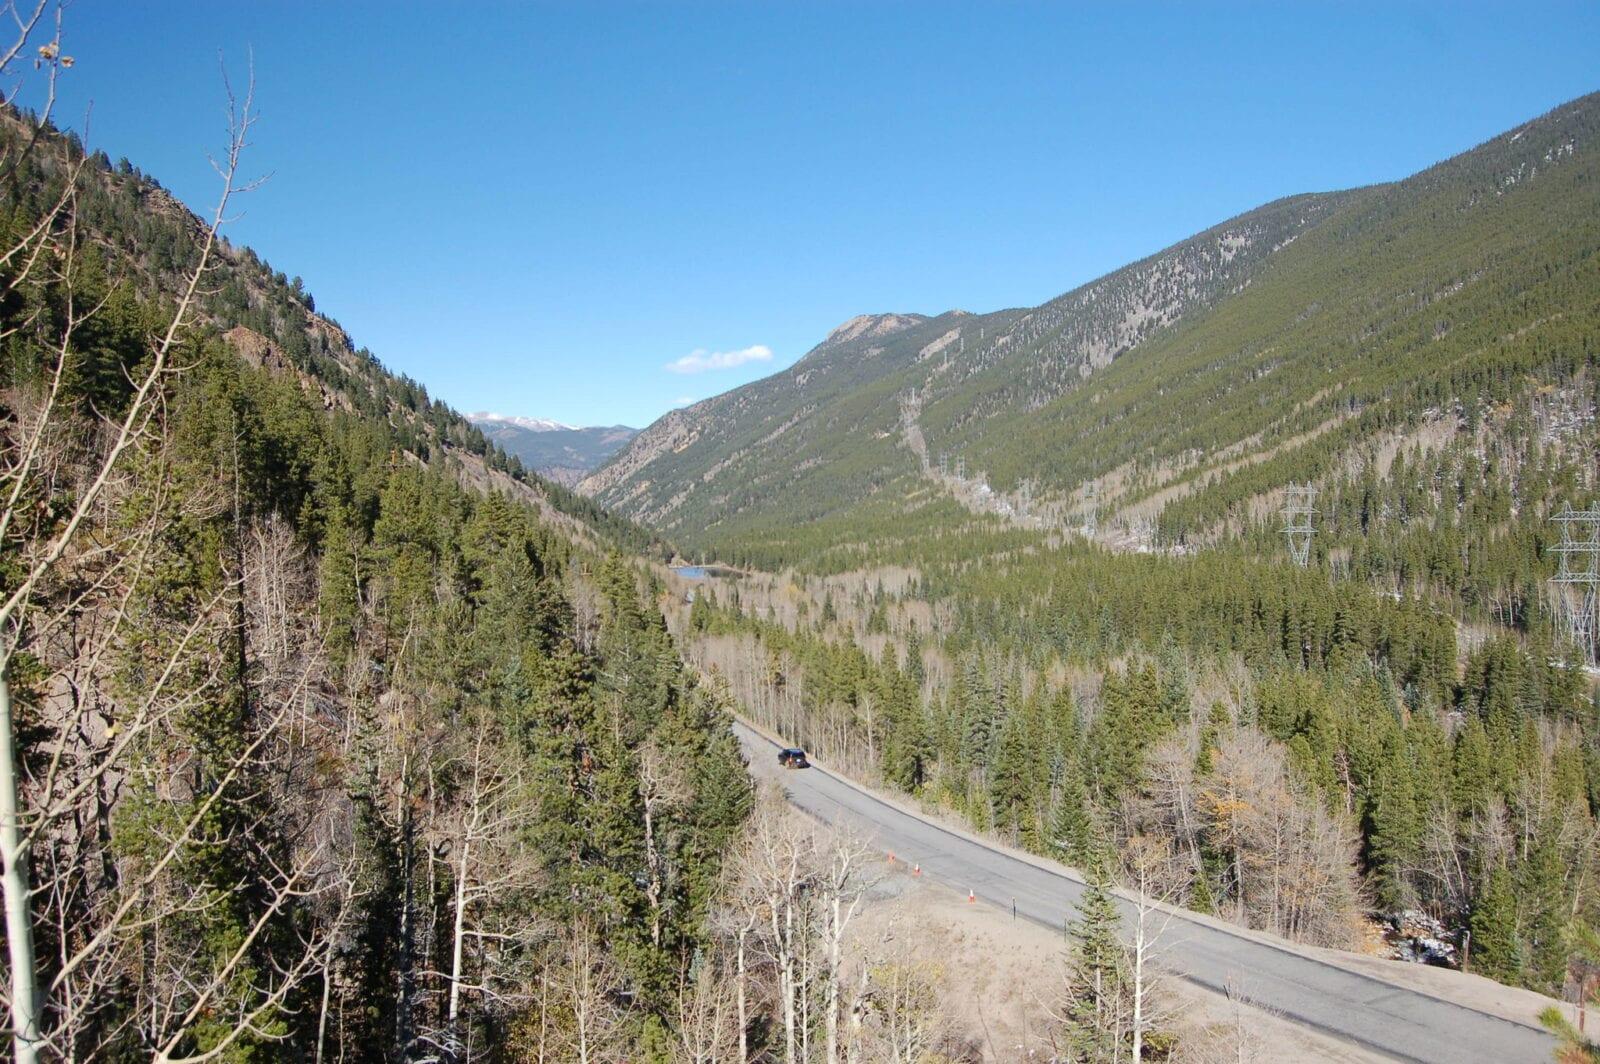 Image of the Guanella Pass near Geneva City, Colorado